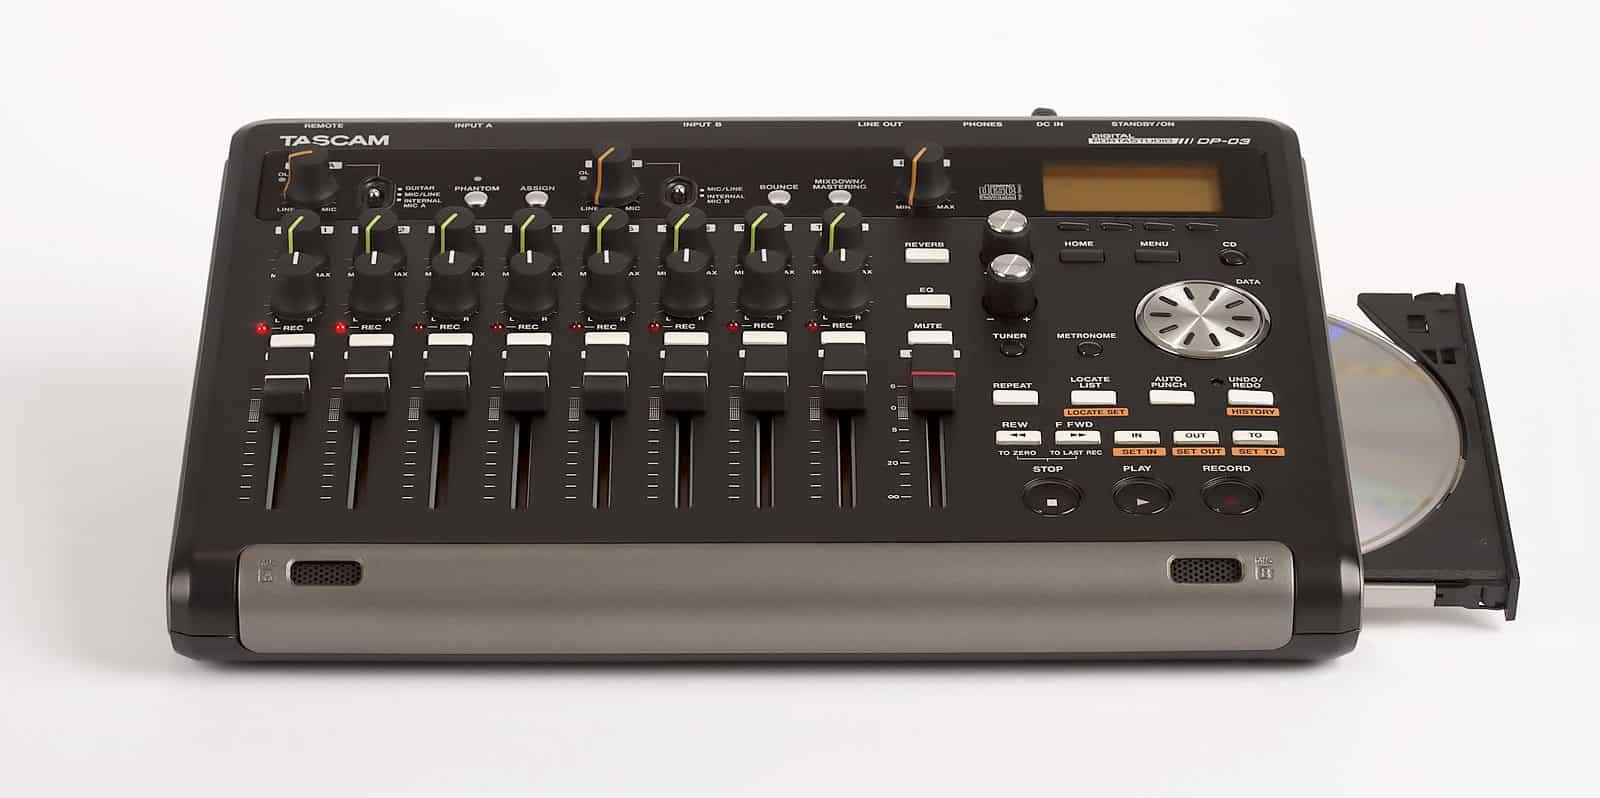 Tascam DP-03 Portastudio: Portables 8-Spur Recording ⋆ delamar.de